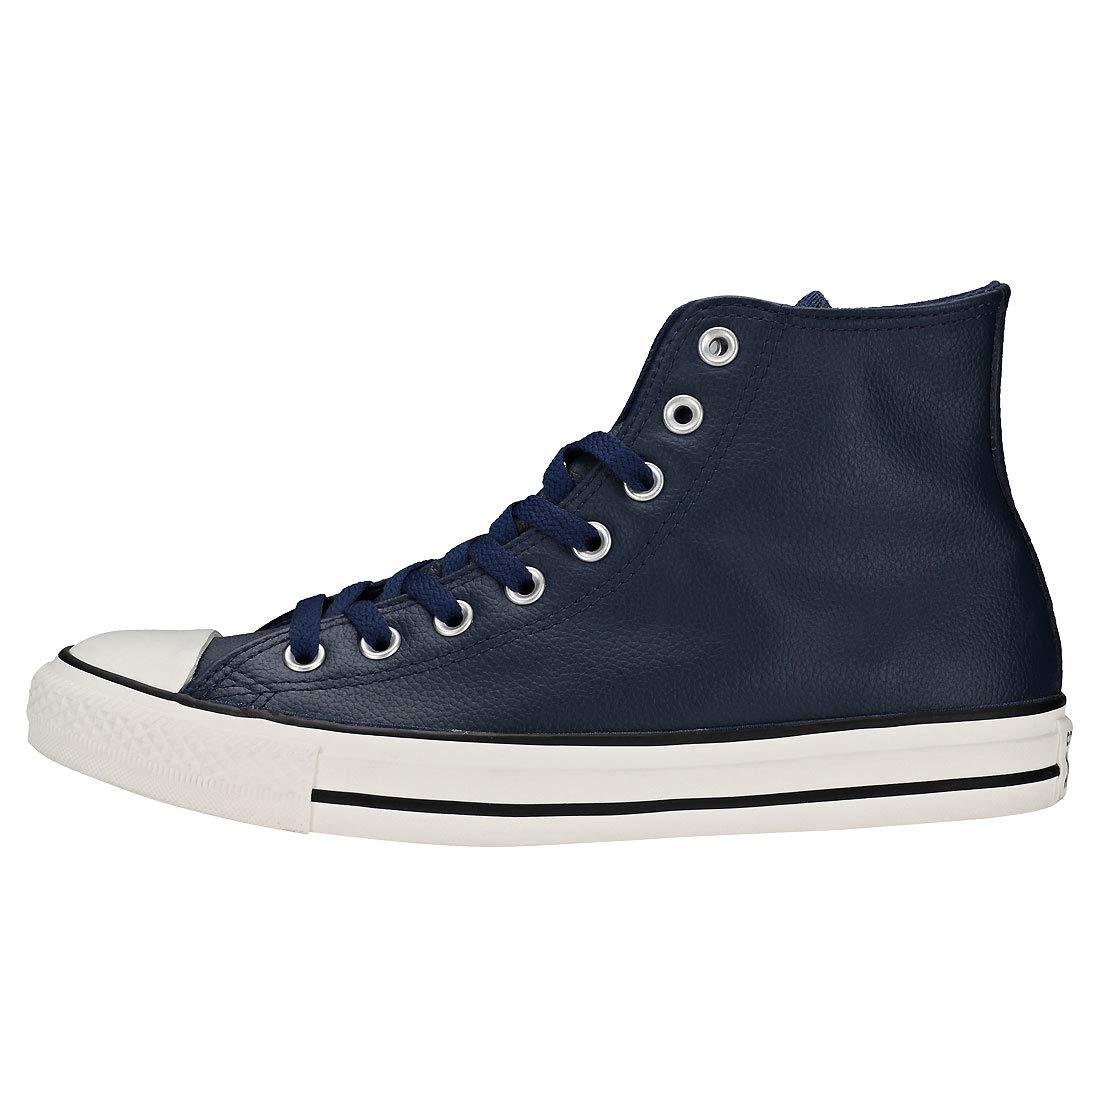 9aaf4b4ae33646 Converse Unisex Adults  CTAS Hi Fitness Shoes  Amazon.co.uk  Shoes ...